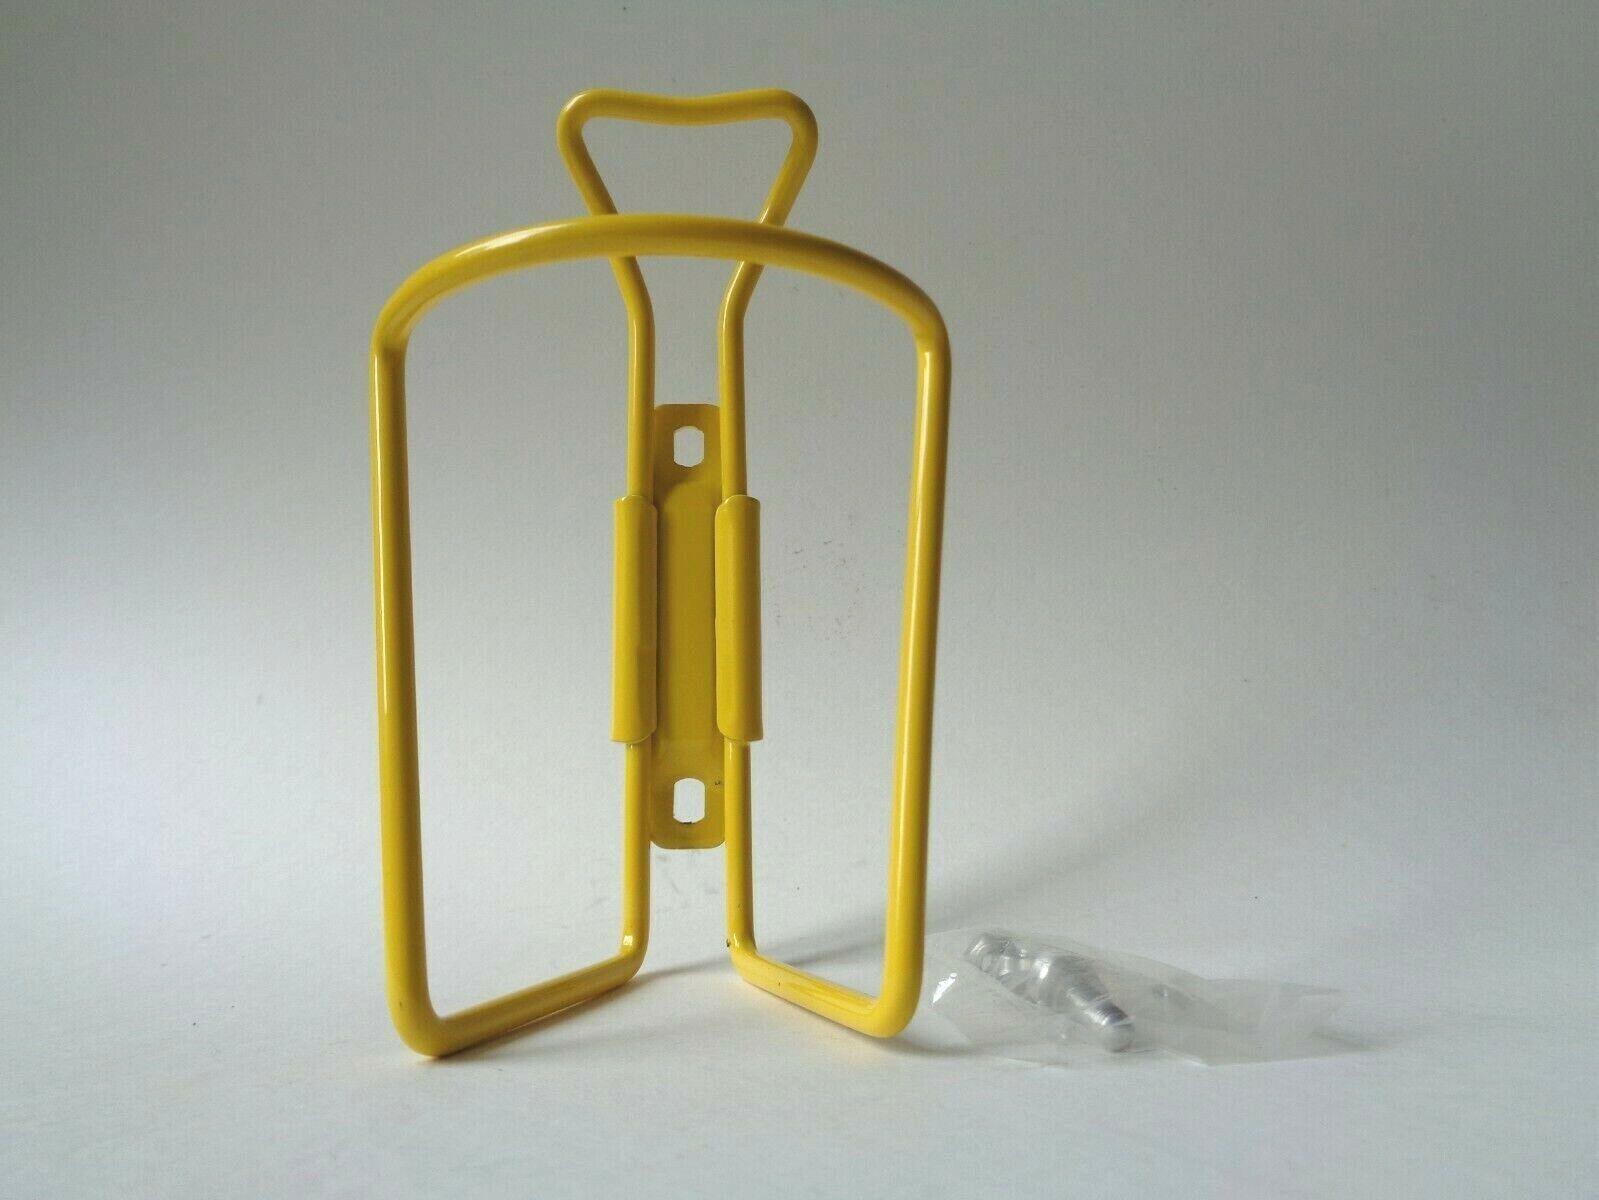 NOS Vintage  1980s OMAS Superleggera Alu Yellow water bottle cage holder  be in great demand